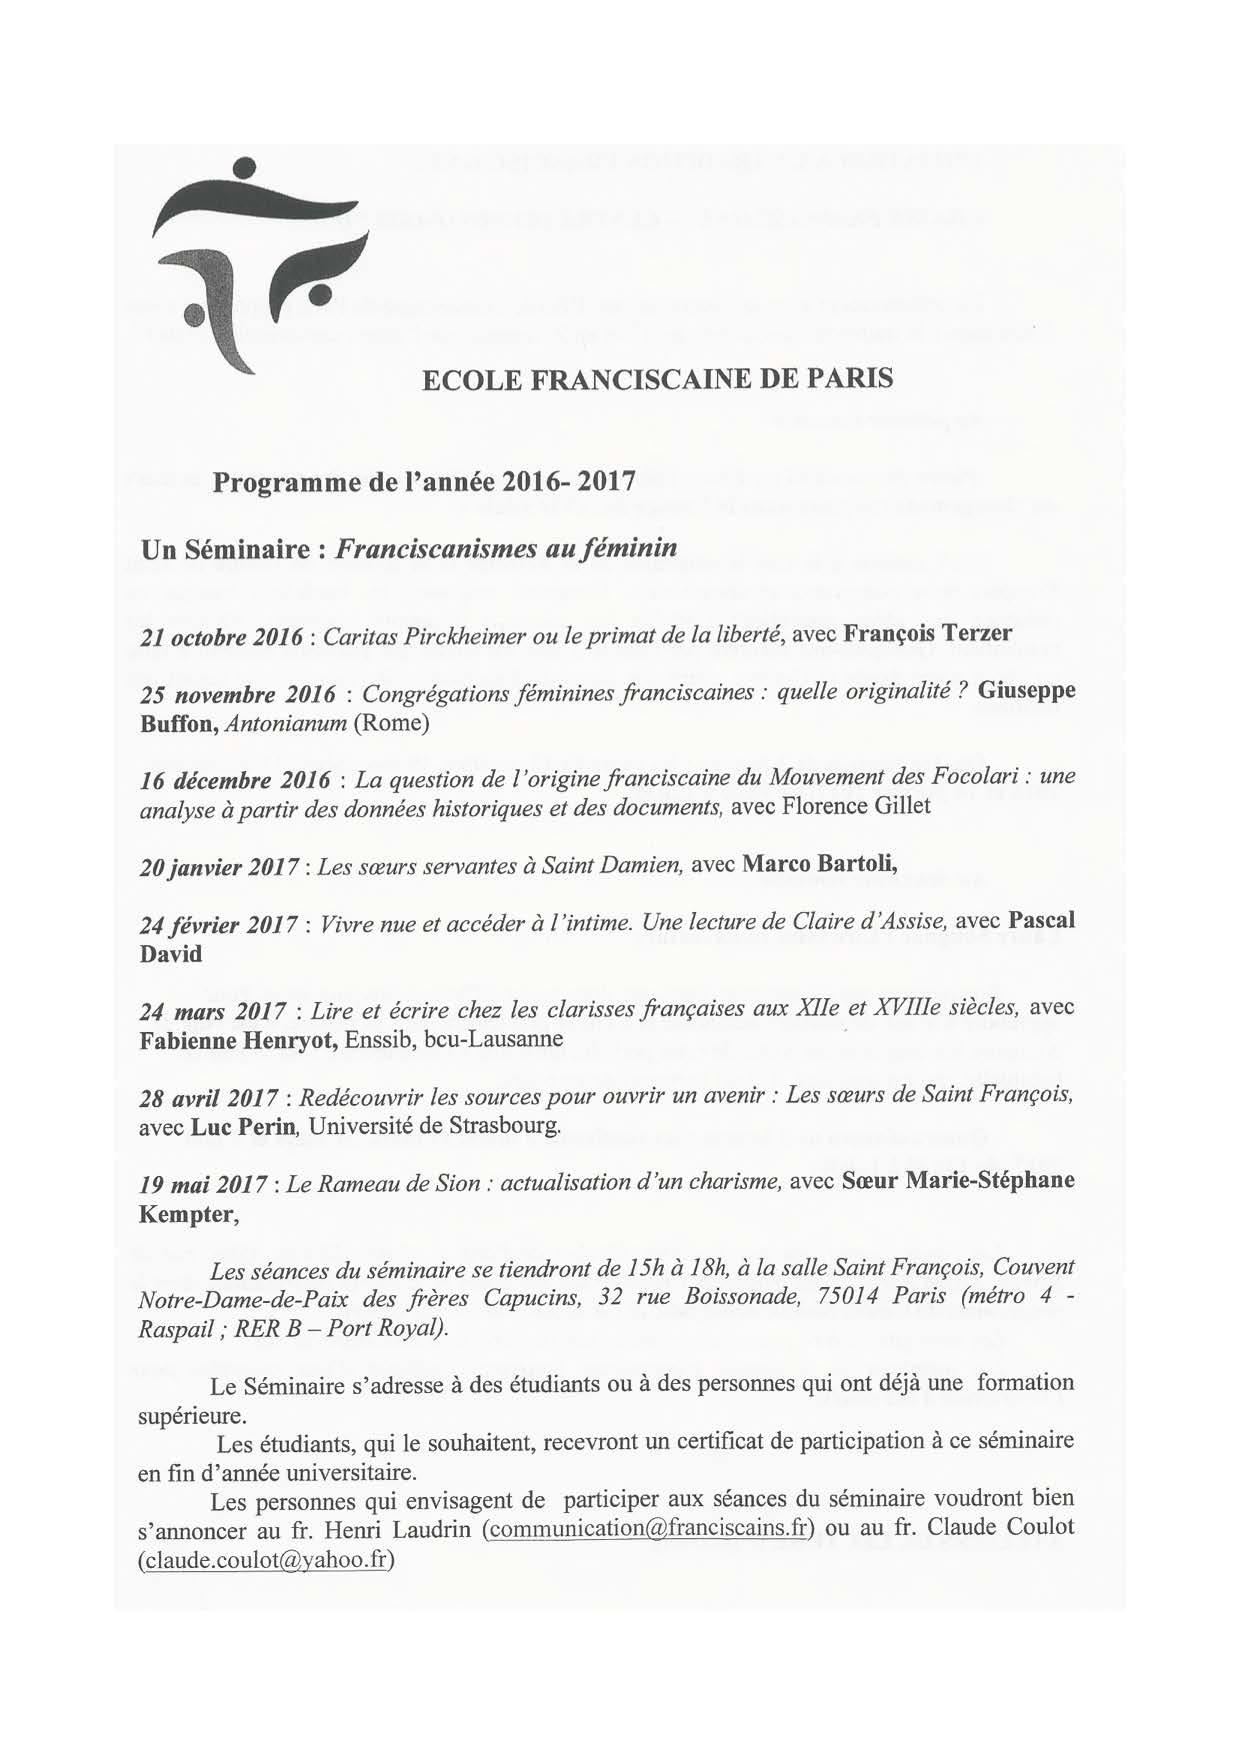 2016_2017_programme.jpg